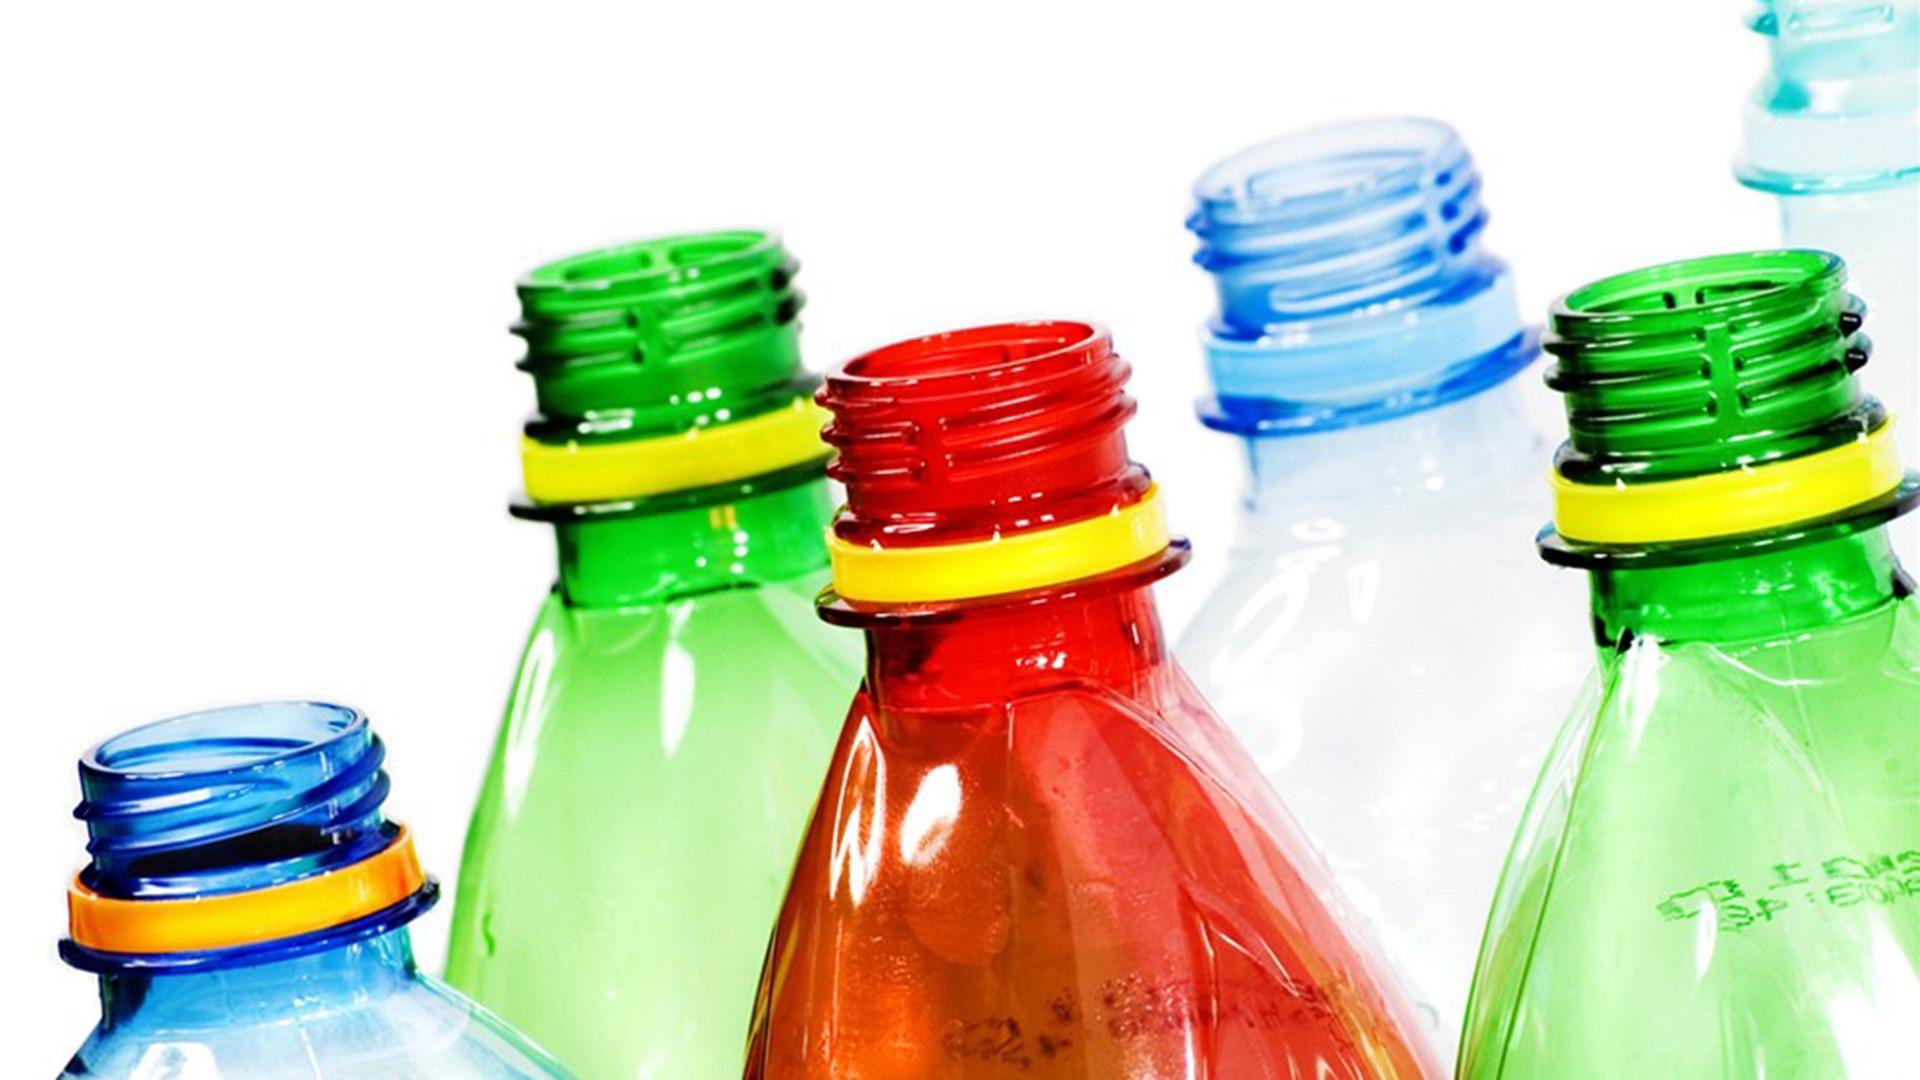 Zomerakkoord rond het afvalplan